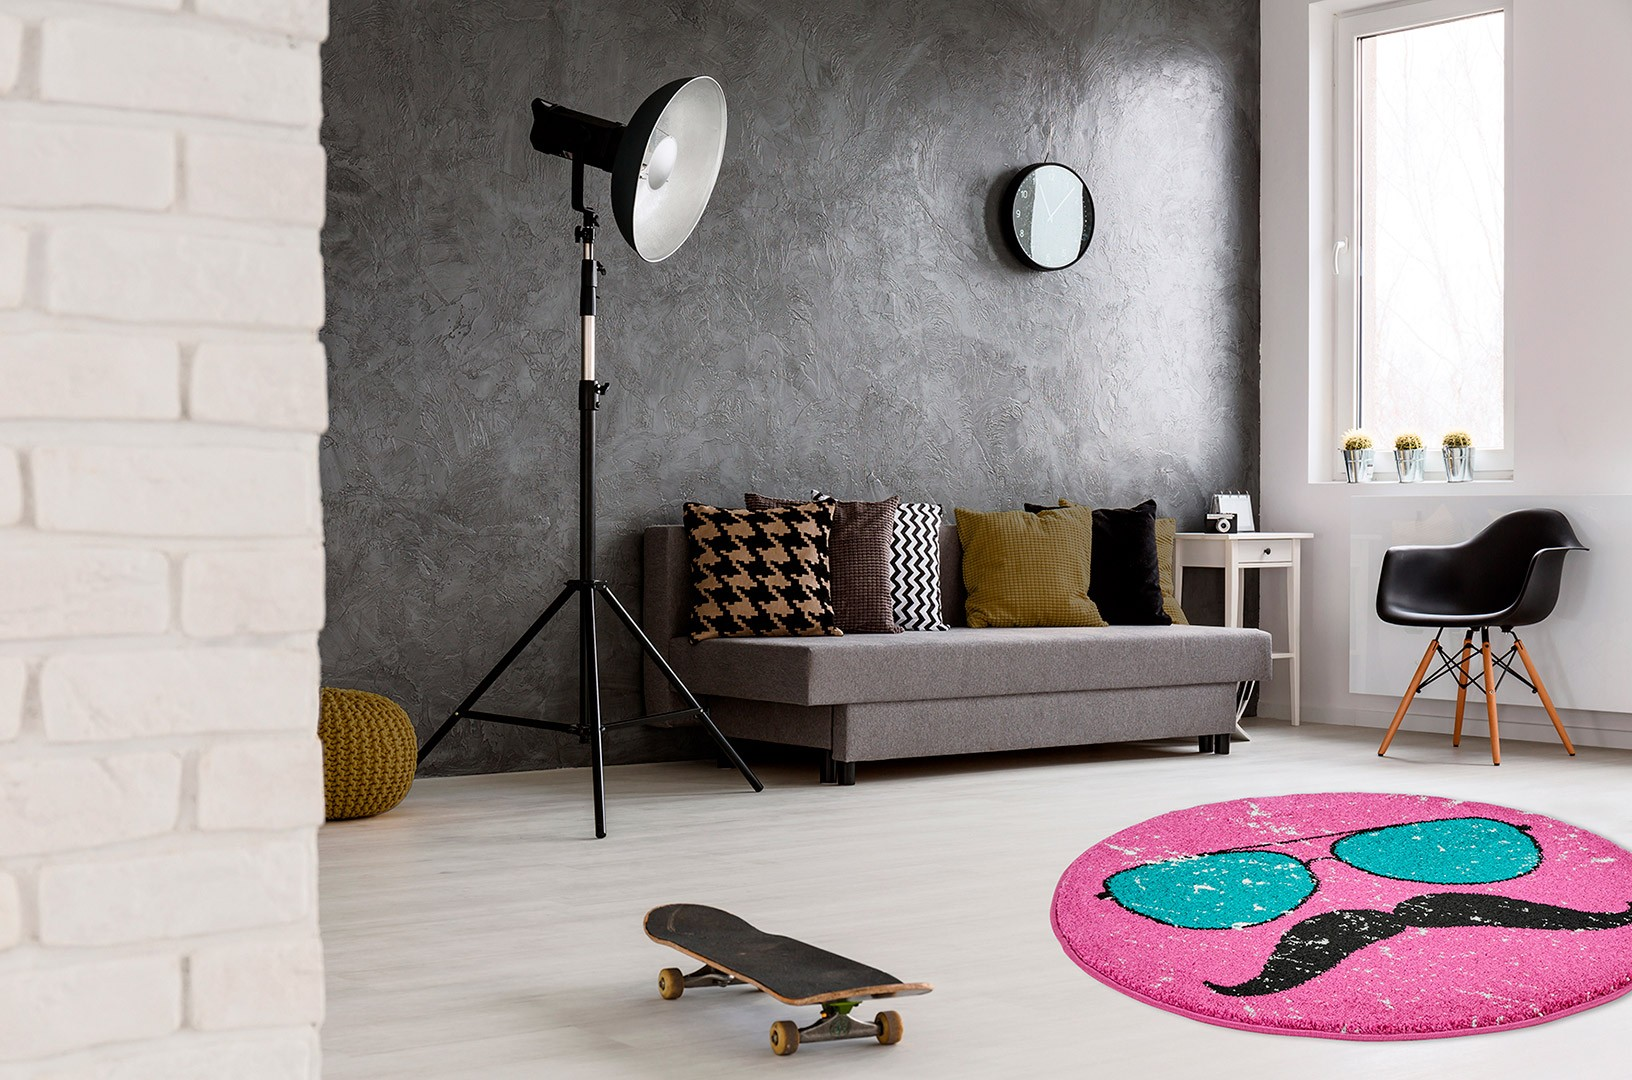 petit tapis rond rose tendance hipster. Black Bedroom Furniture Sets. Home Design Ideas